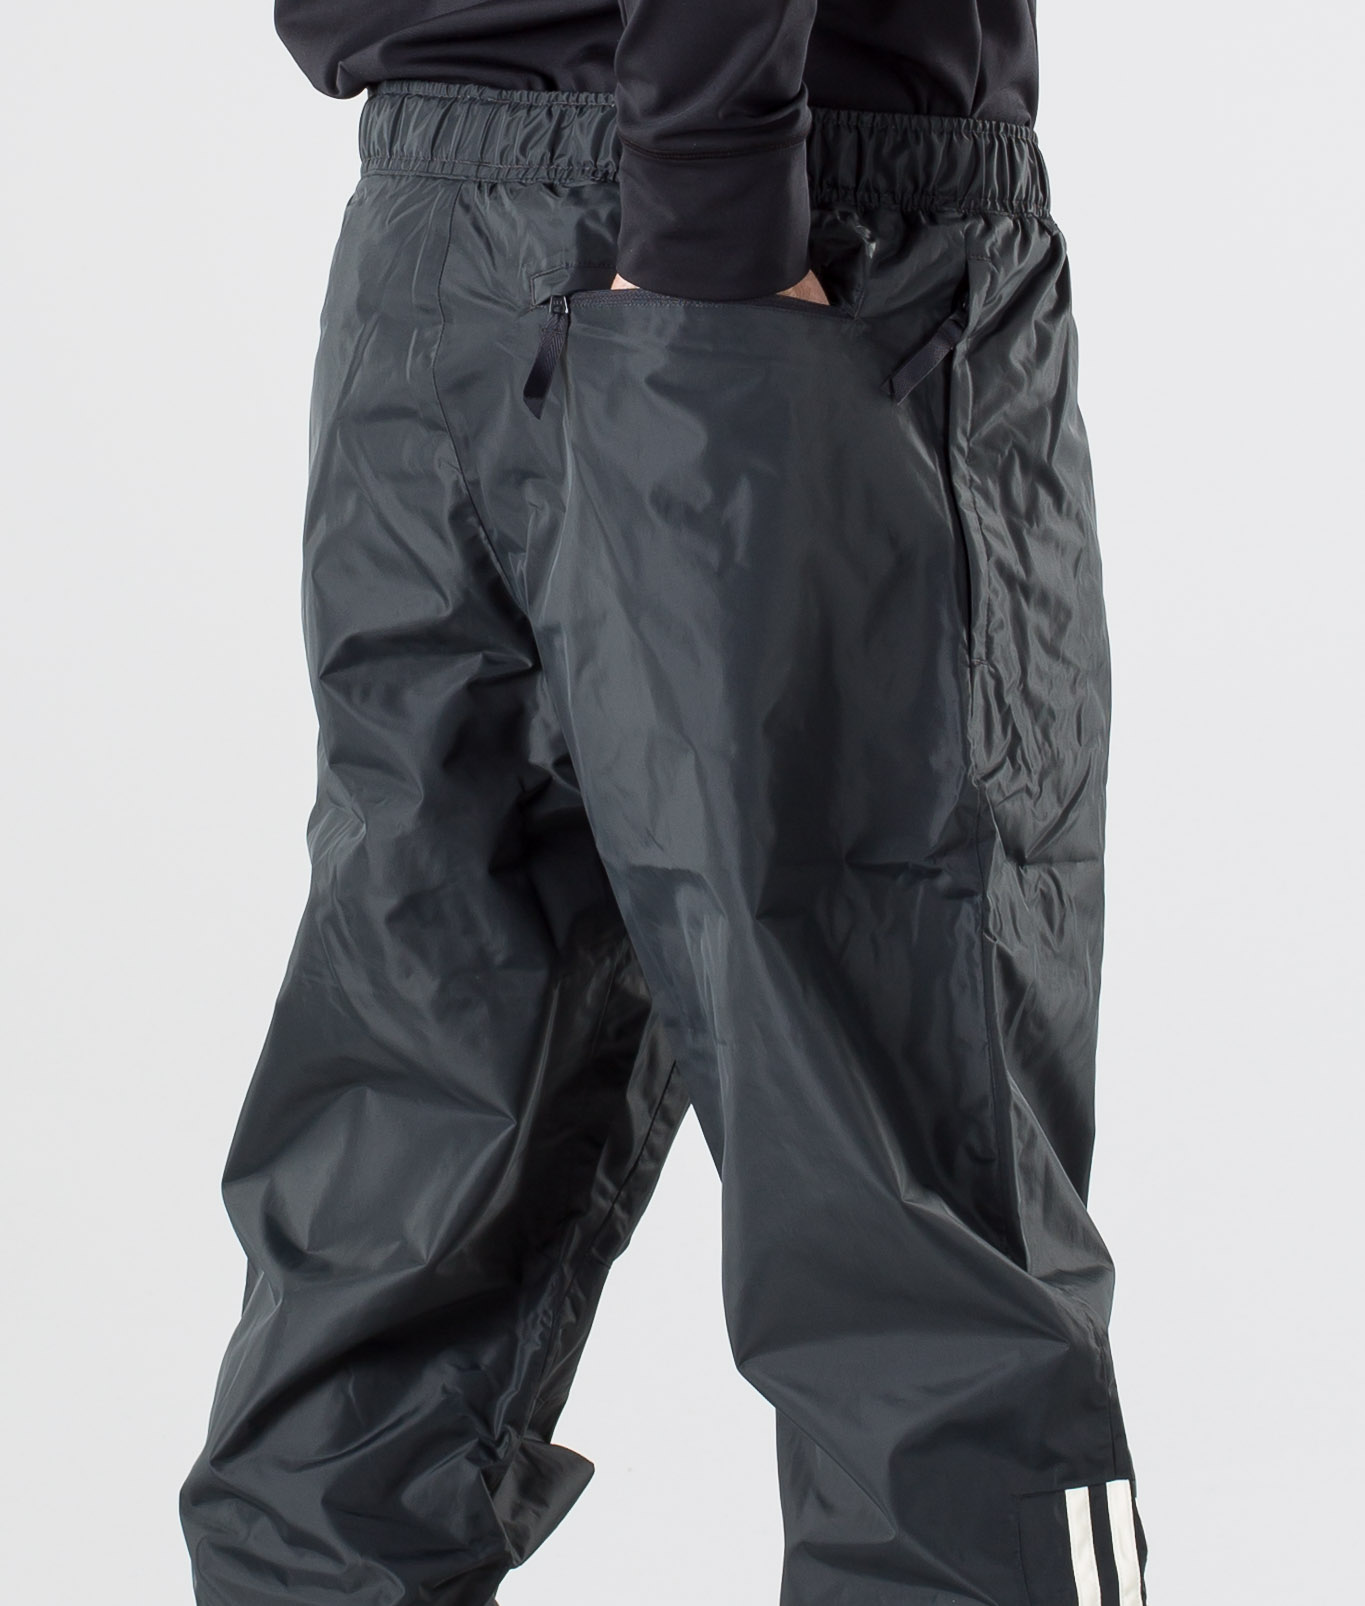 Adidas Snowboarding Comp Snowboardhose Raw SteelNoble